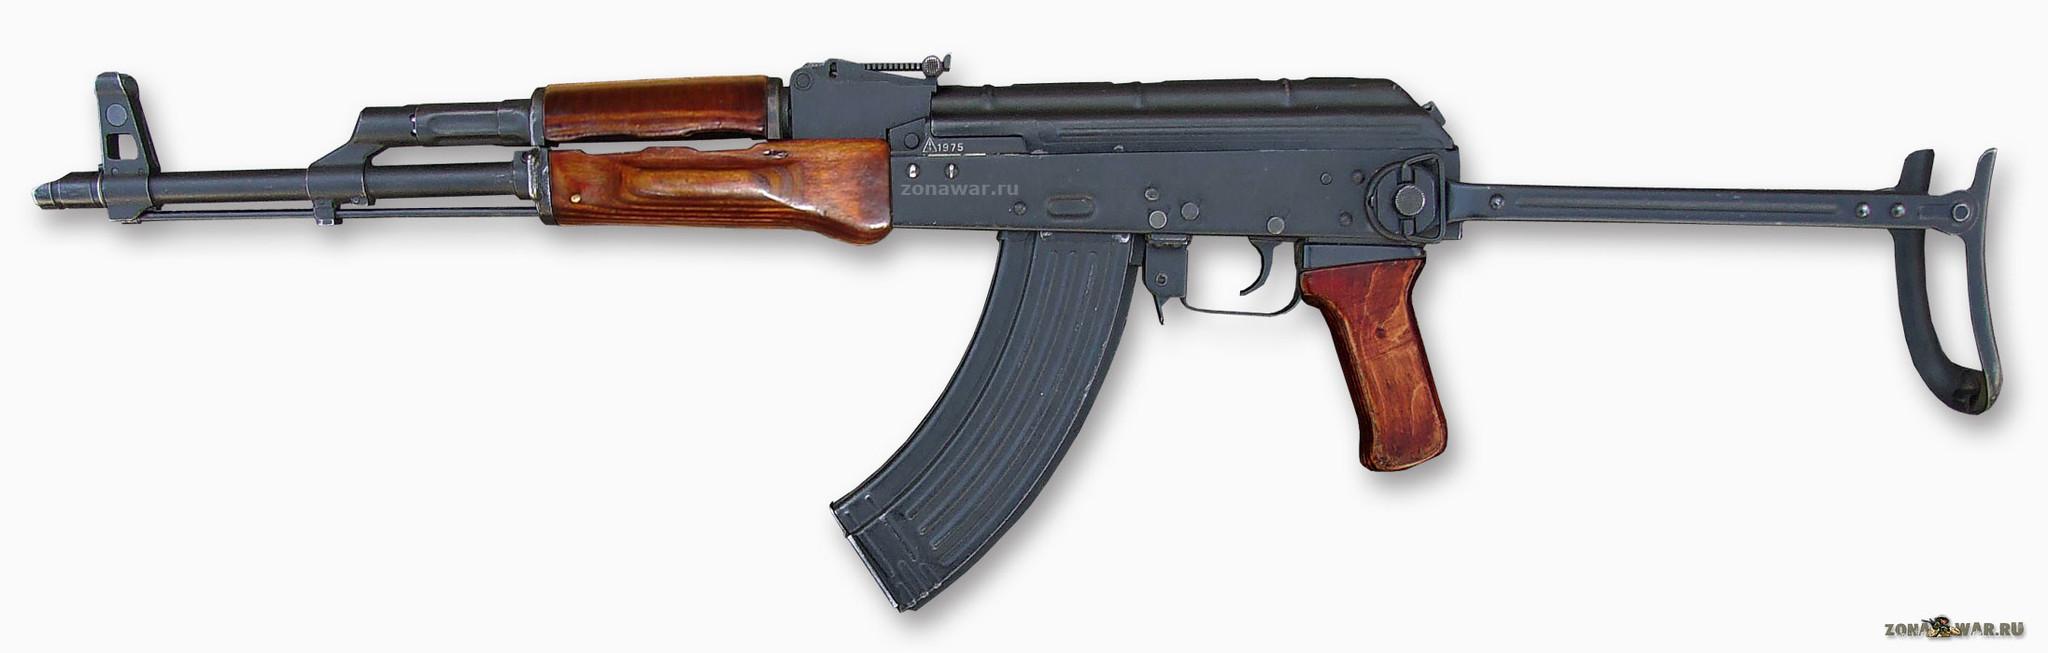 7.62 mm Kalashnikov AKMS modernized assault rifle with folding stock